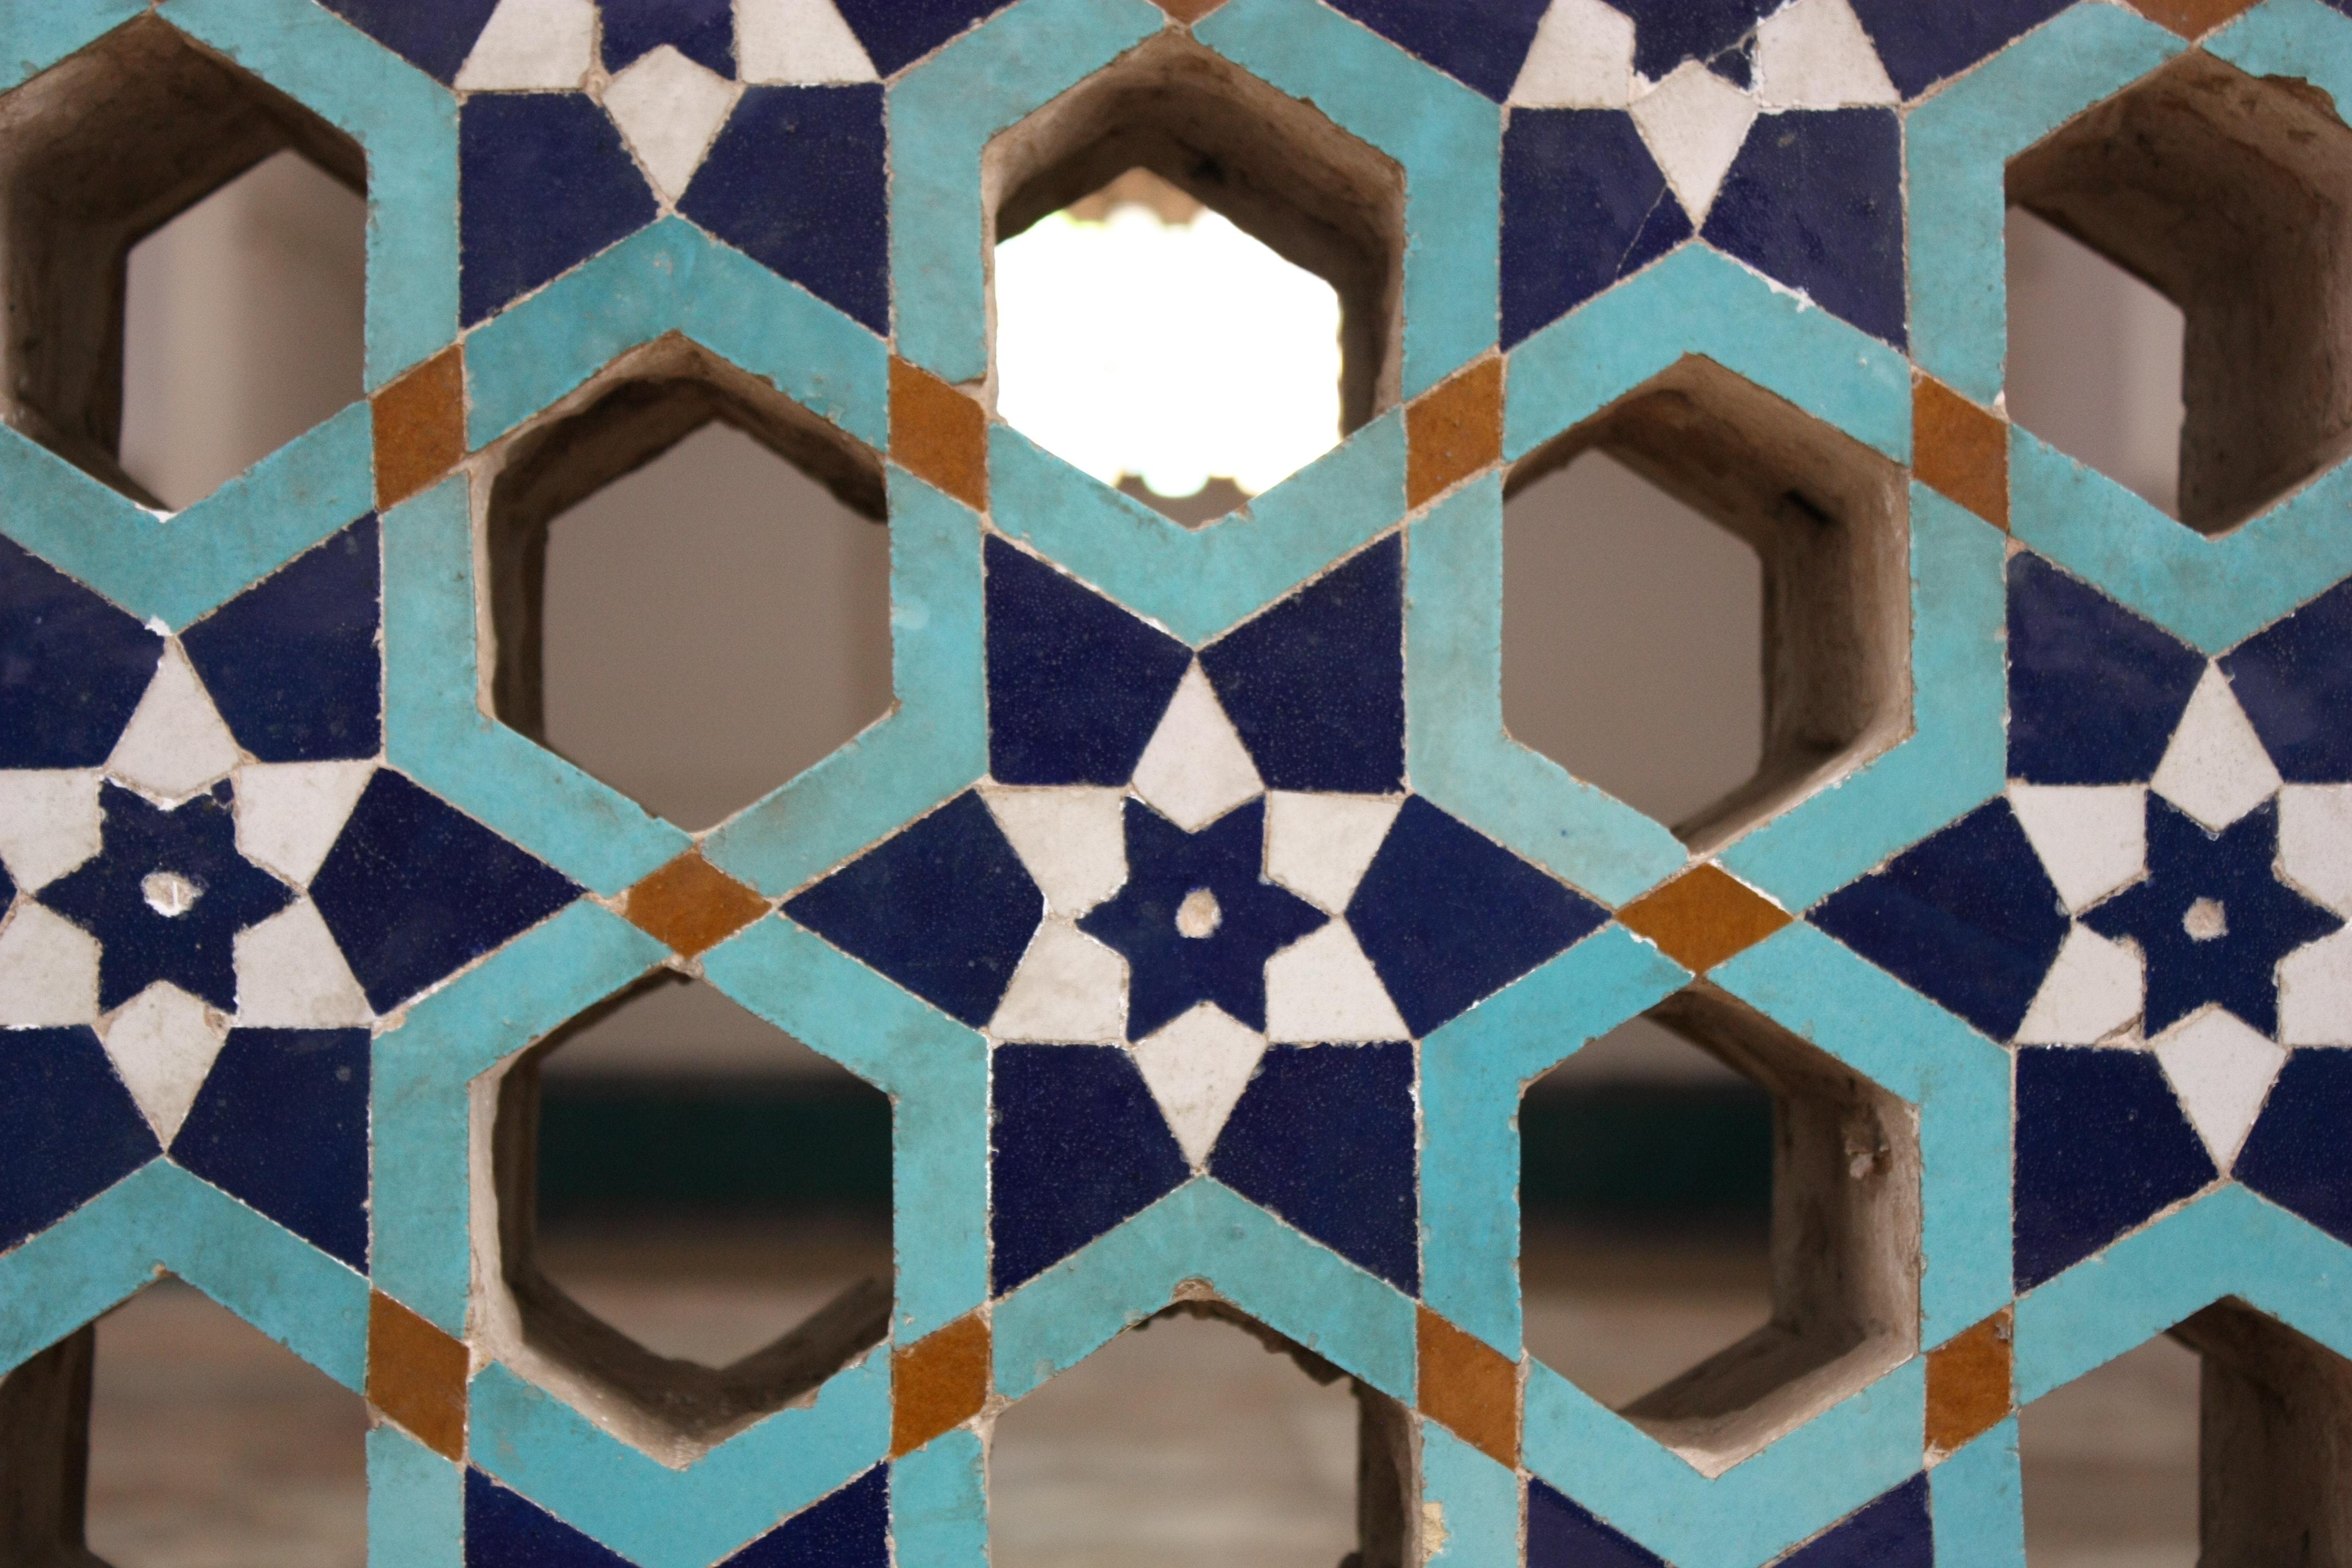 Blue and Light-blue Wooden Organizer, Art, Decoration, Design, Geometric, HQ Photo